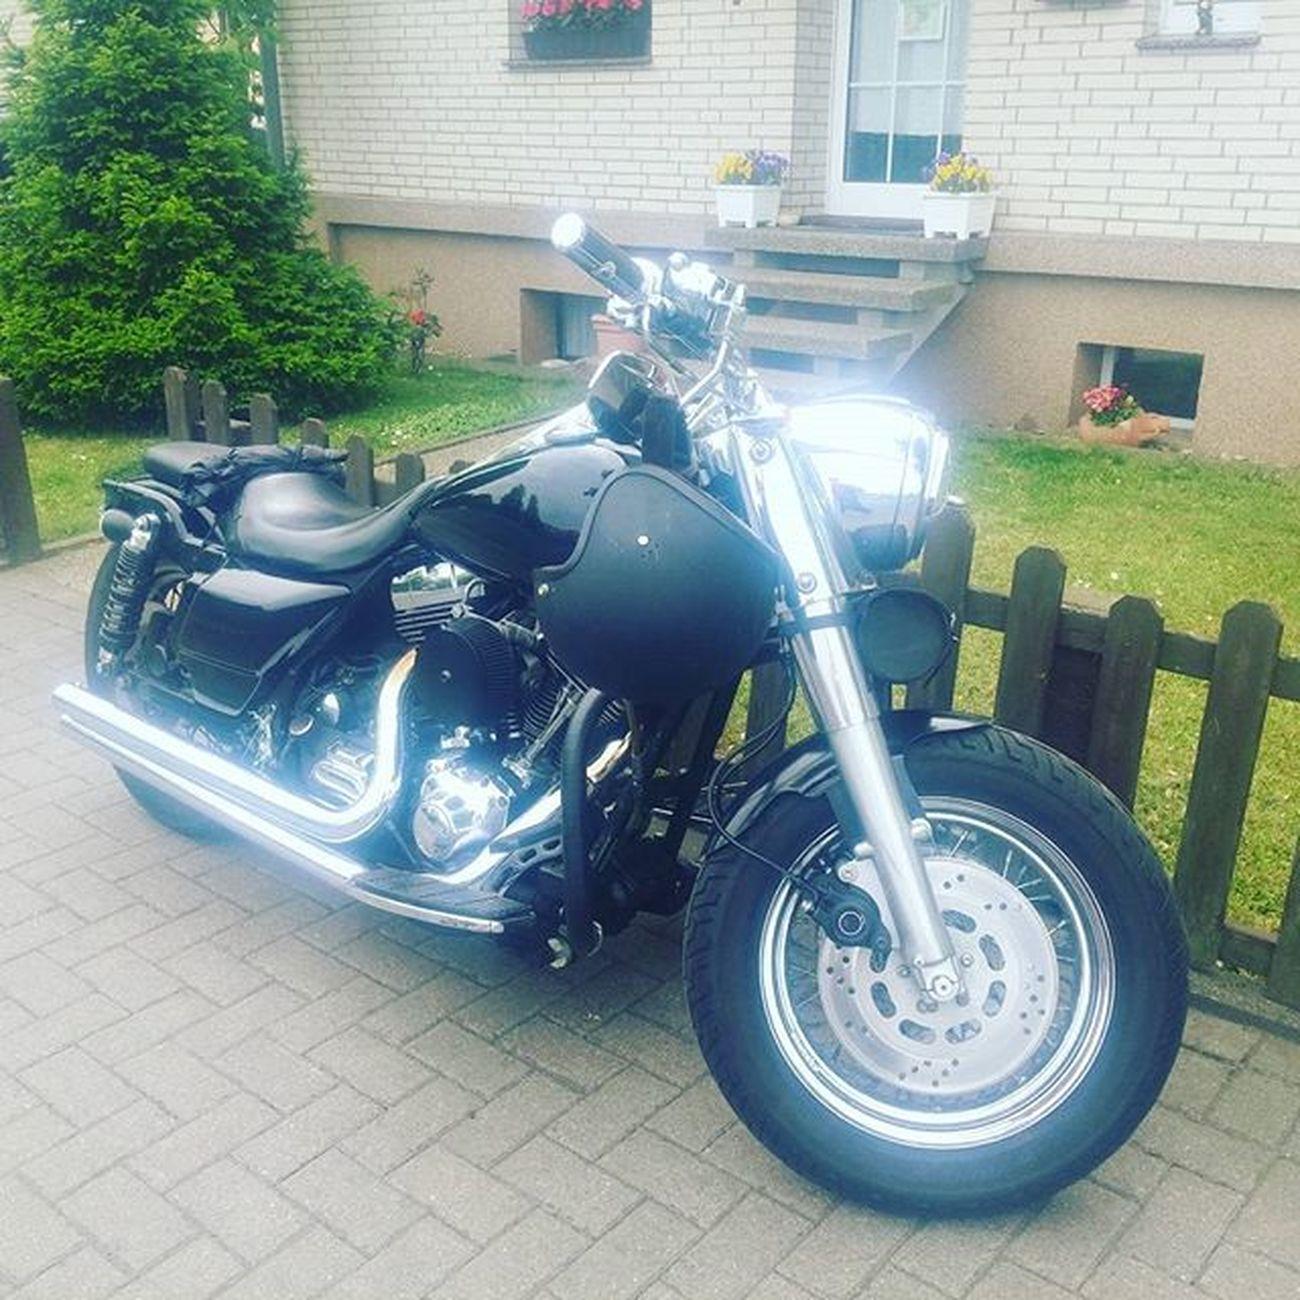 Harley4life Loudpipessavelifes Justharley 2Brothers Loveyourharleydielaughing Harley Harleydavidson Choppedharley Rocknroll MyLifeMyRules Ftw Dortmund Ruhrpott NRW HaveFun RideOrDie Tattoos Milwaukeeiron